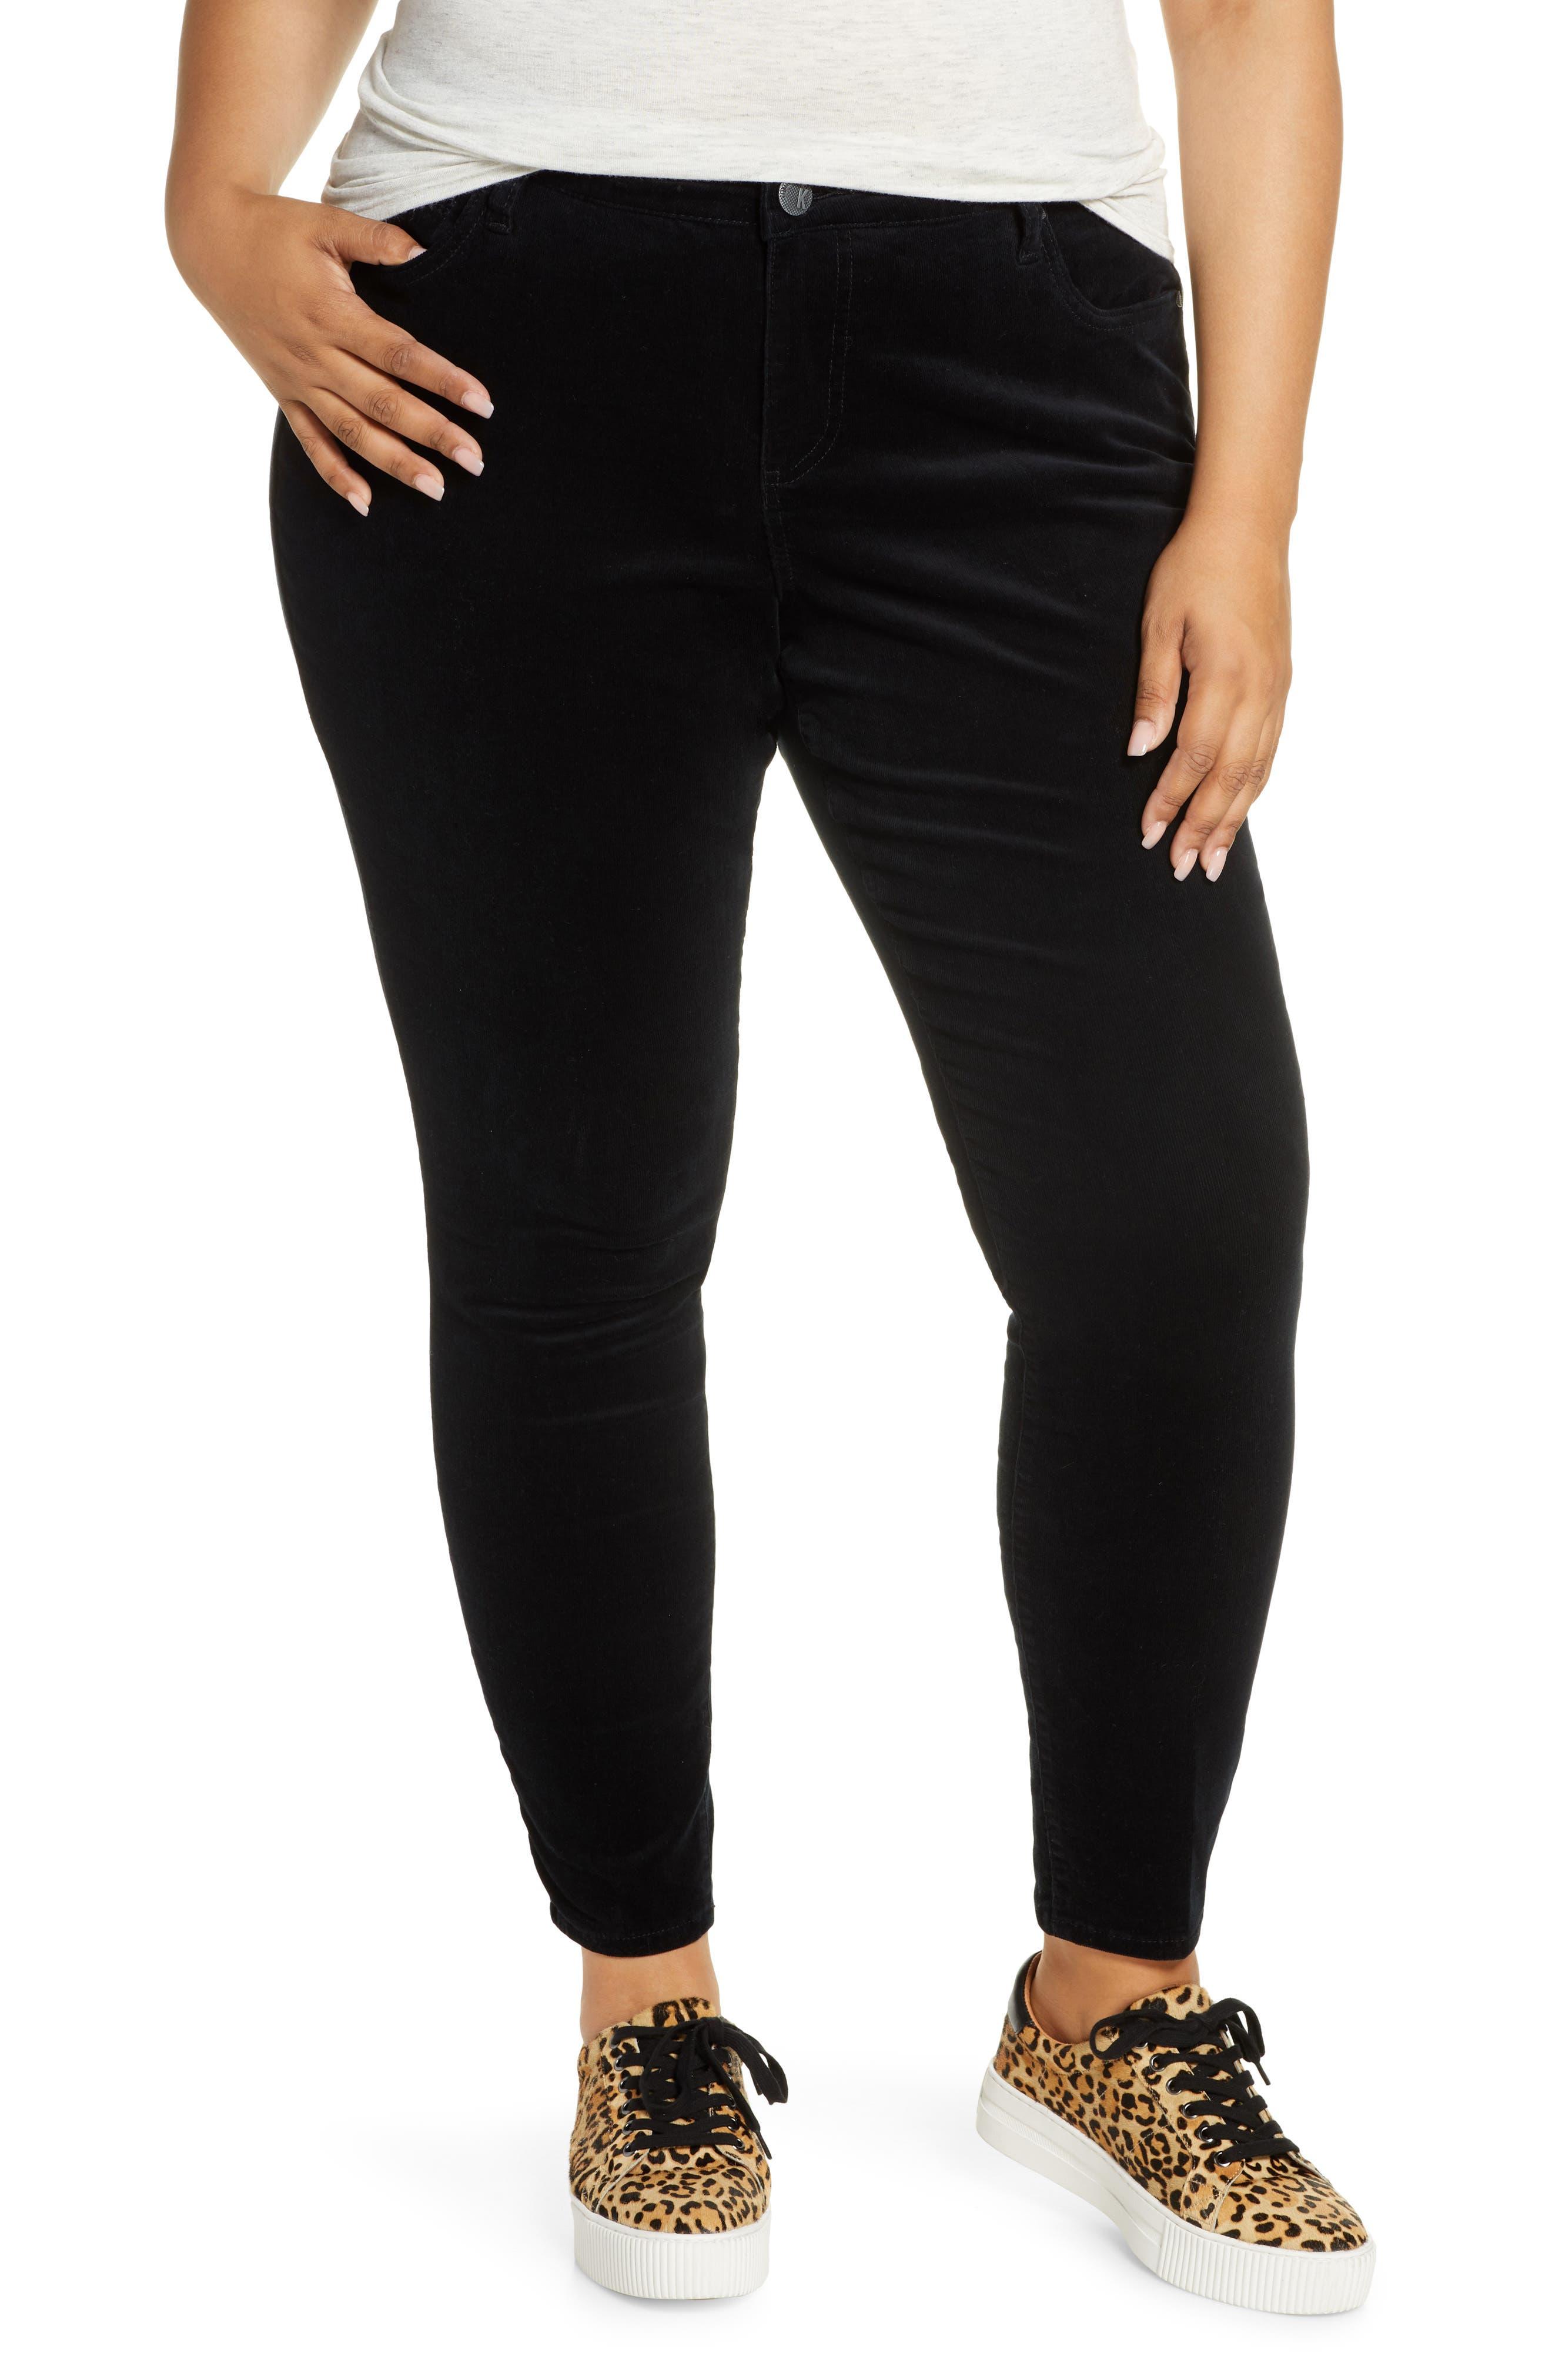 Diana Cord Skinny Jeans